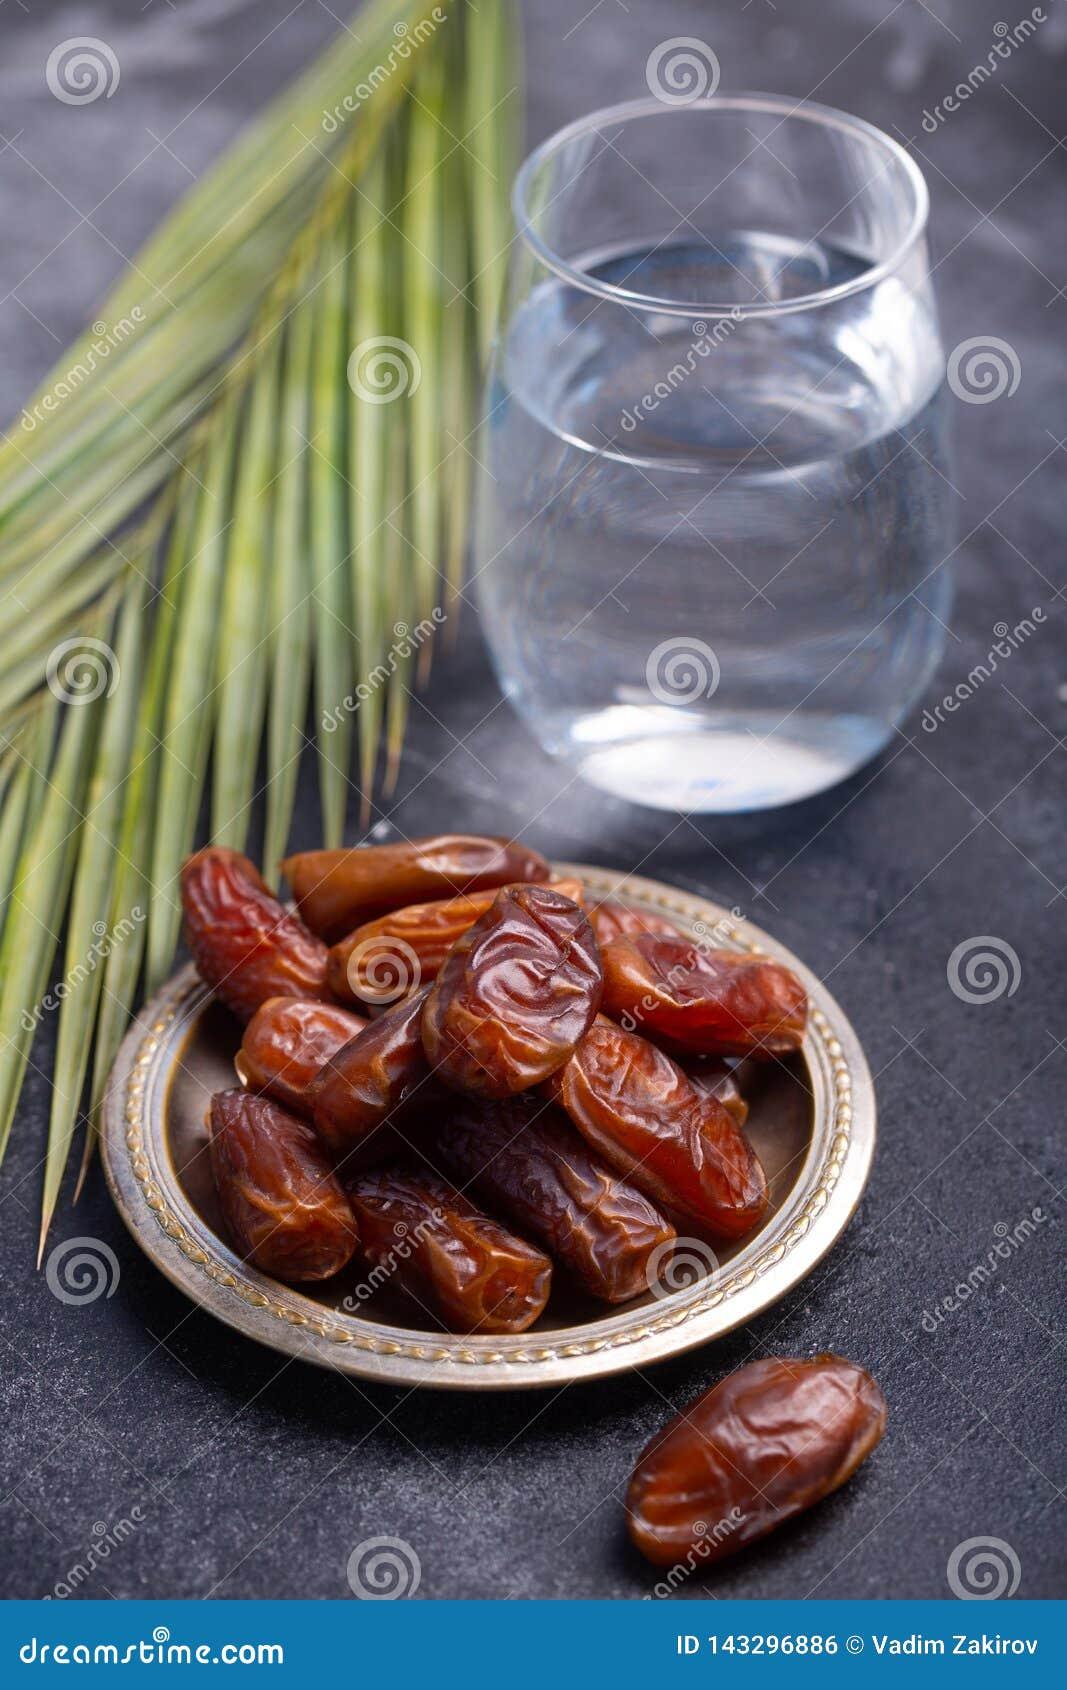 Ramadan Dates Is Traditional Food For Iftar In Islamic World